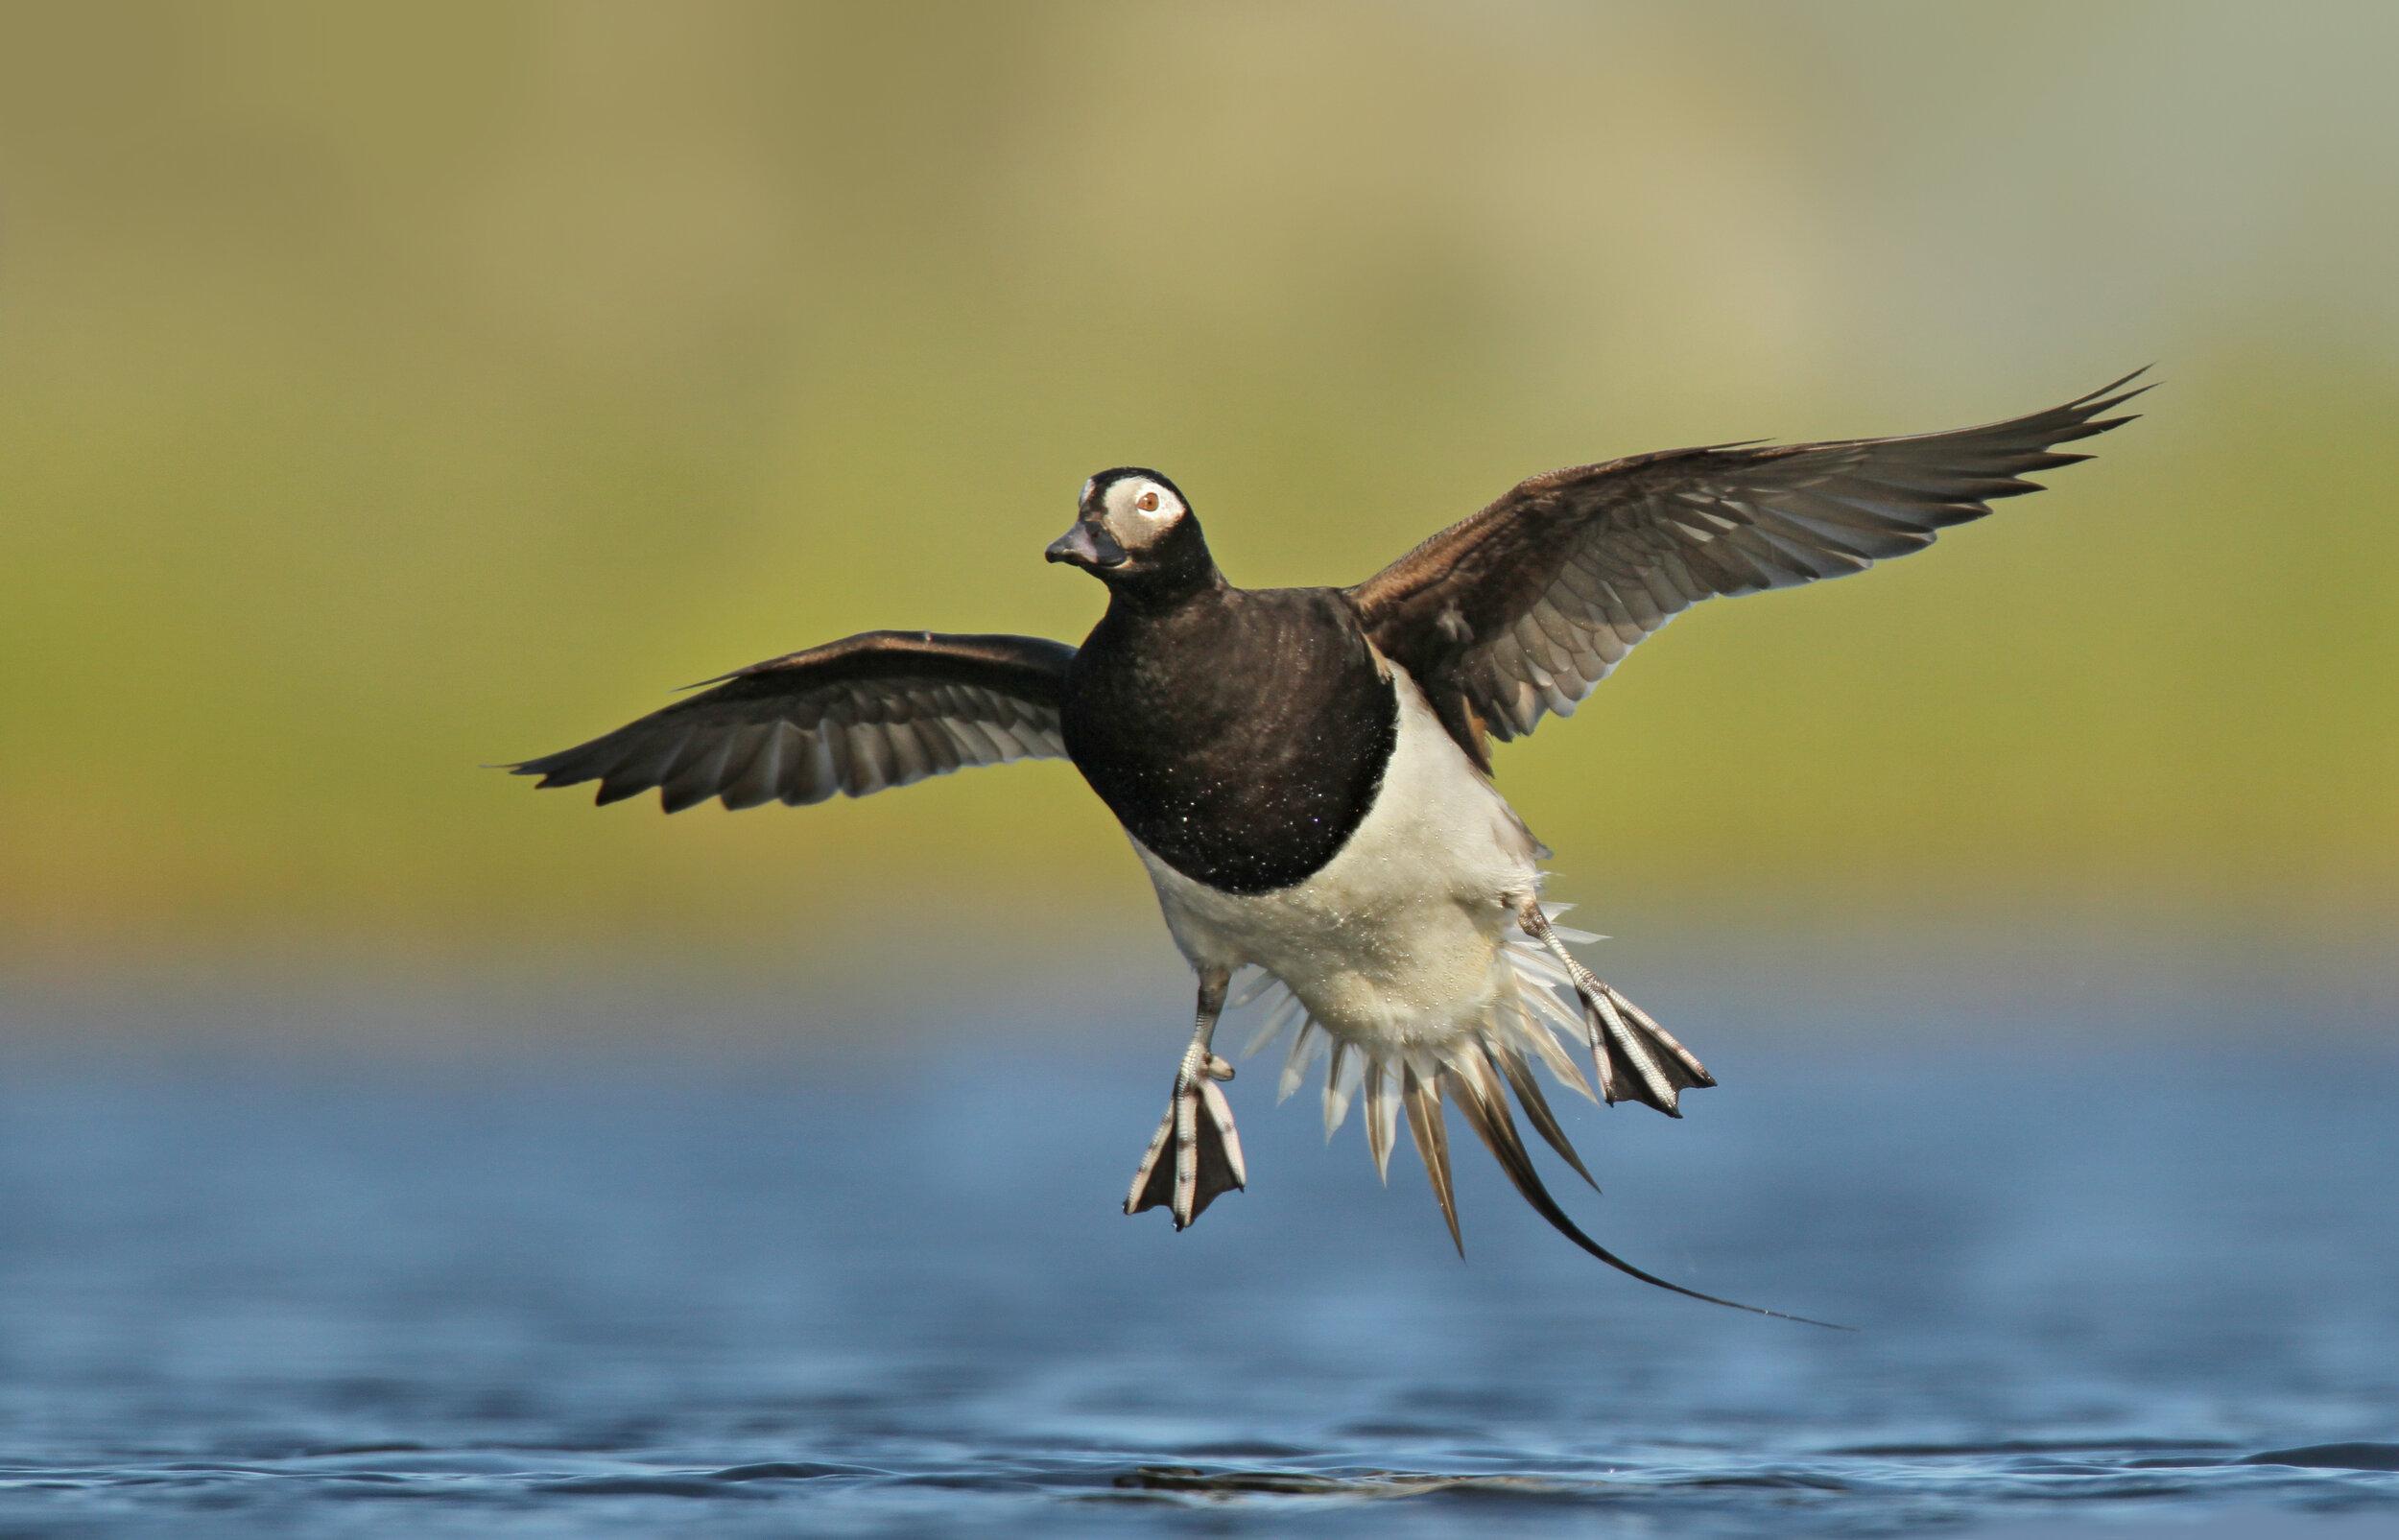 long-tailed_duck_EI8C0328618b.jpg